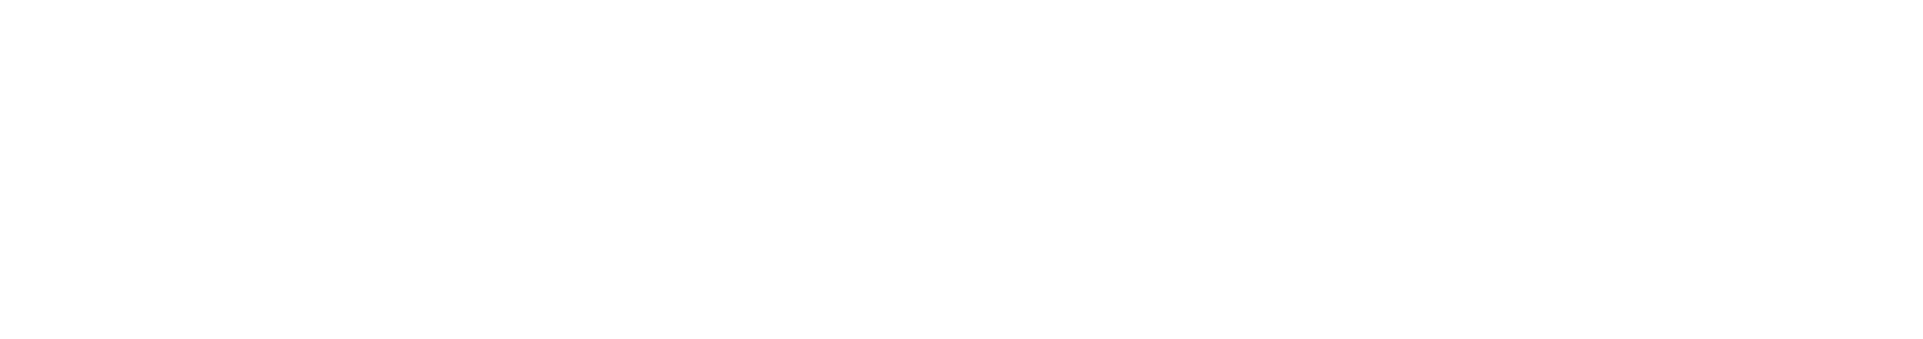 Al Saad Power Projects